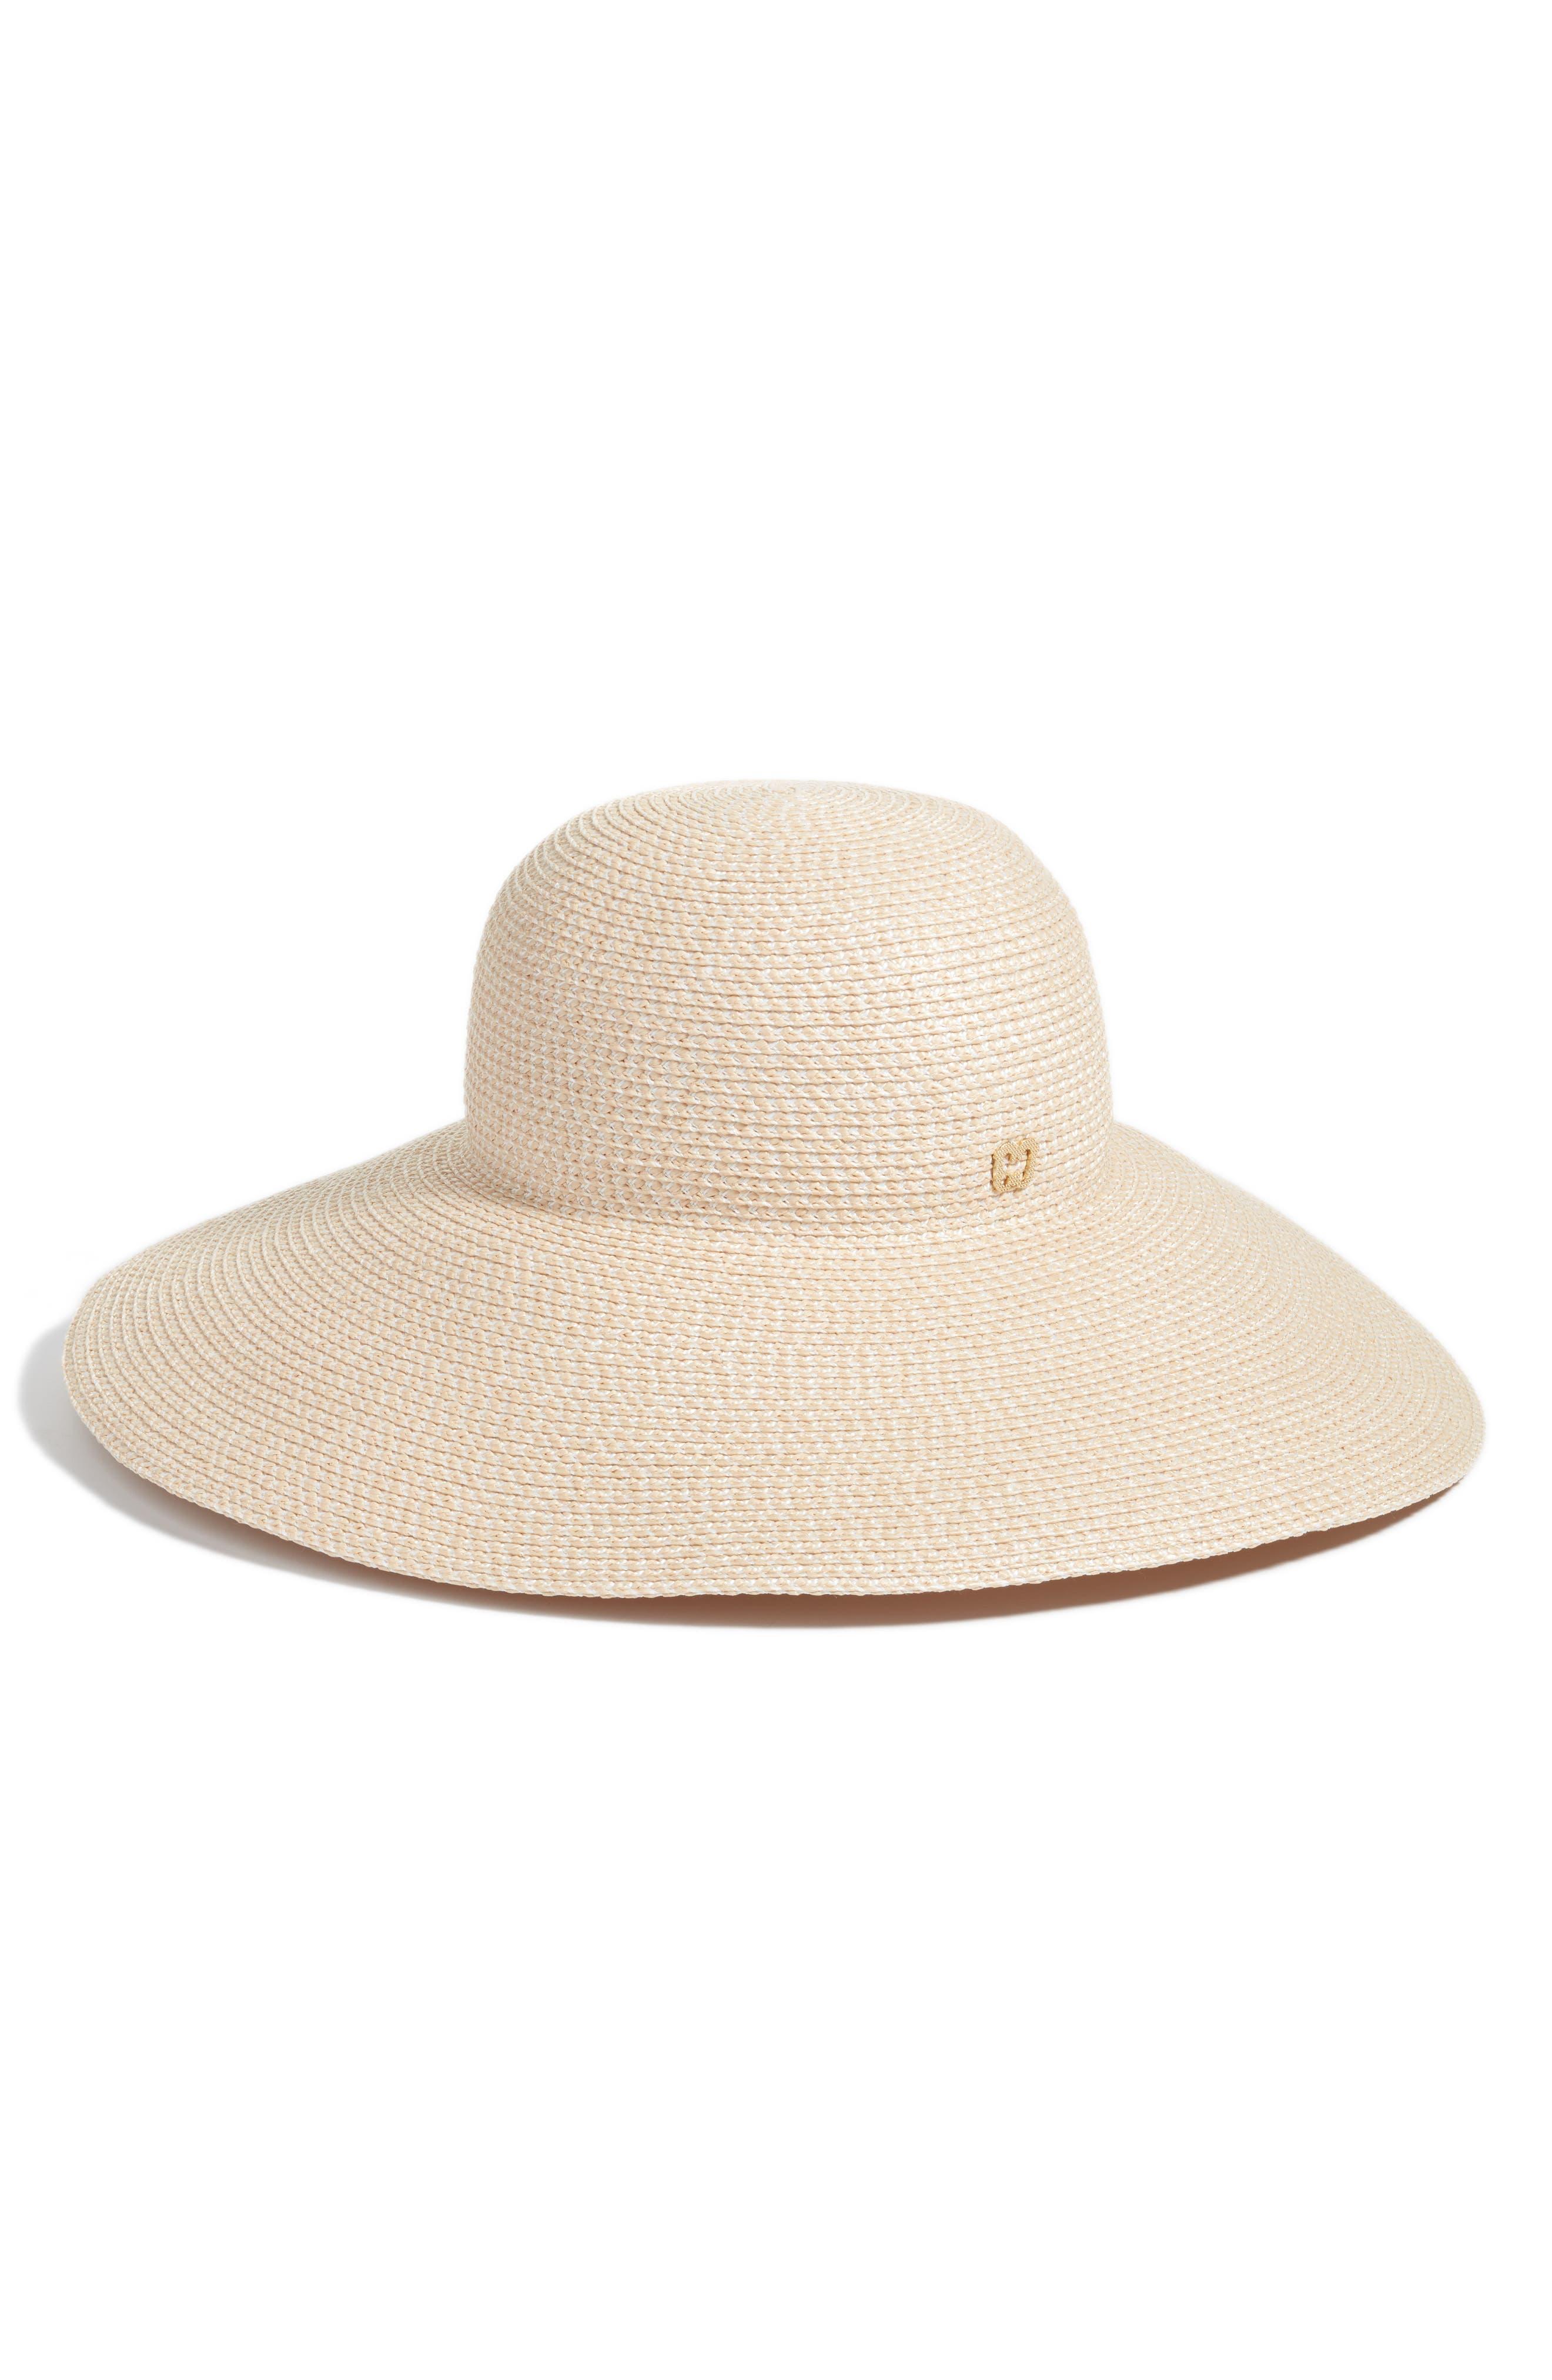 Main Image - Eric Javits Bella Squishee® Sun Hat